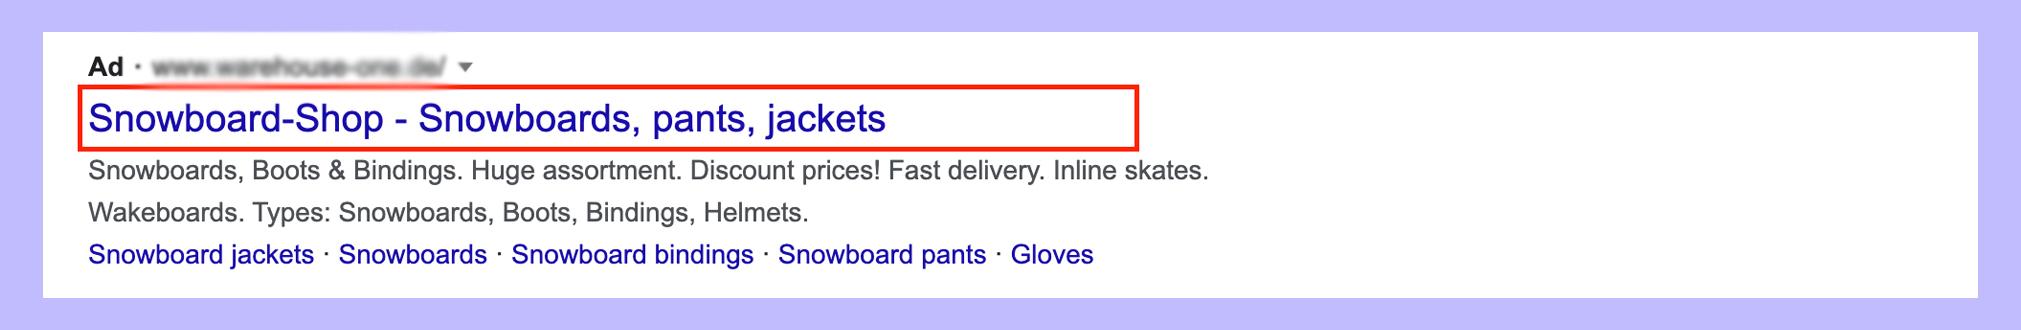 Google_ads_copywriting